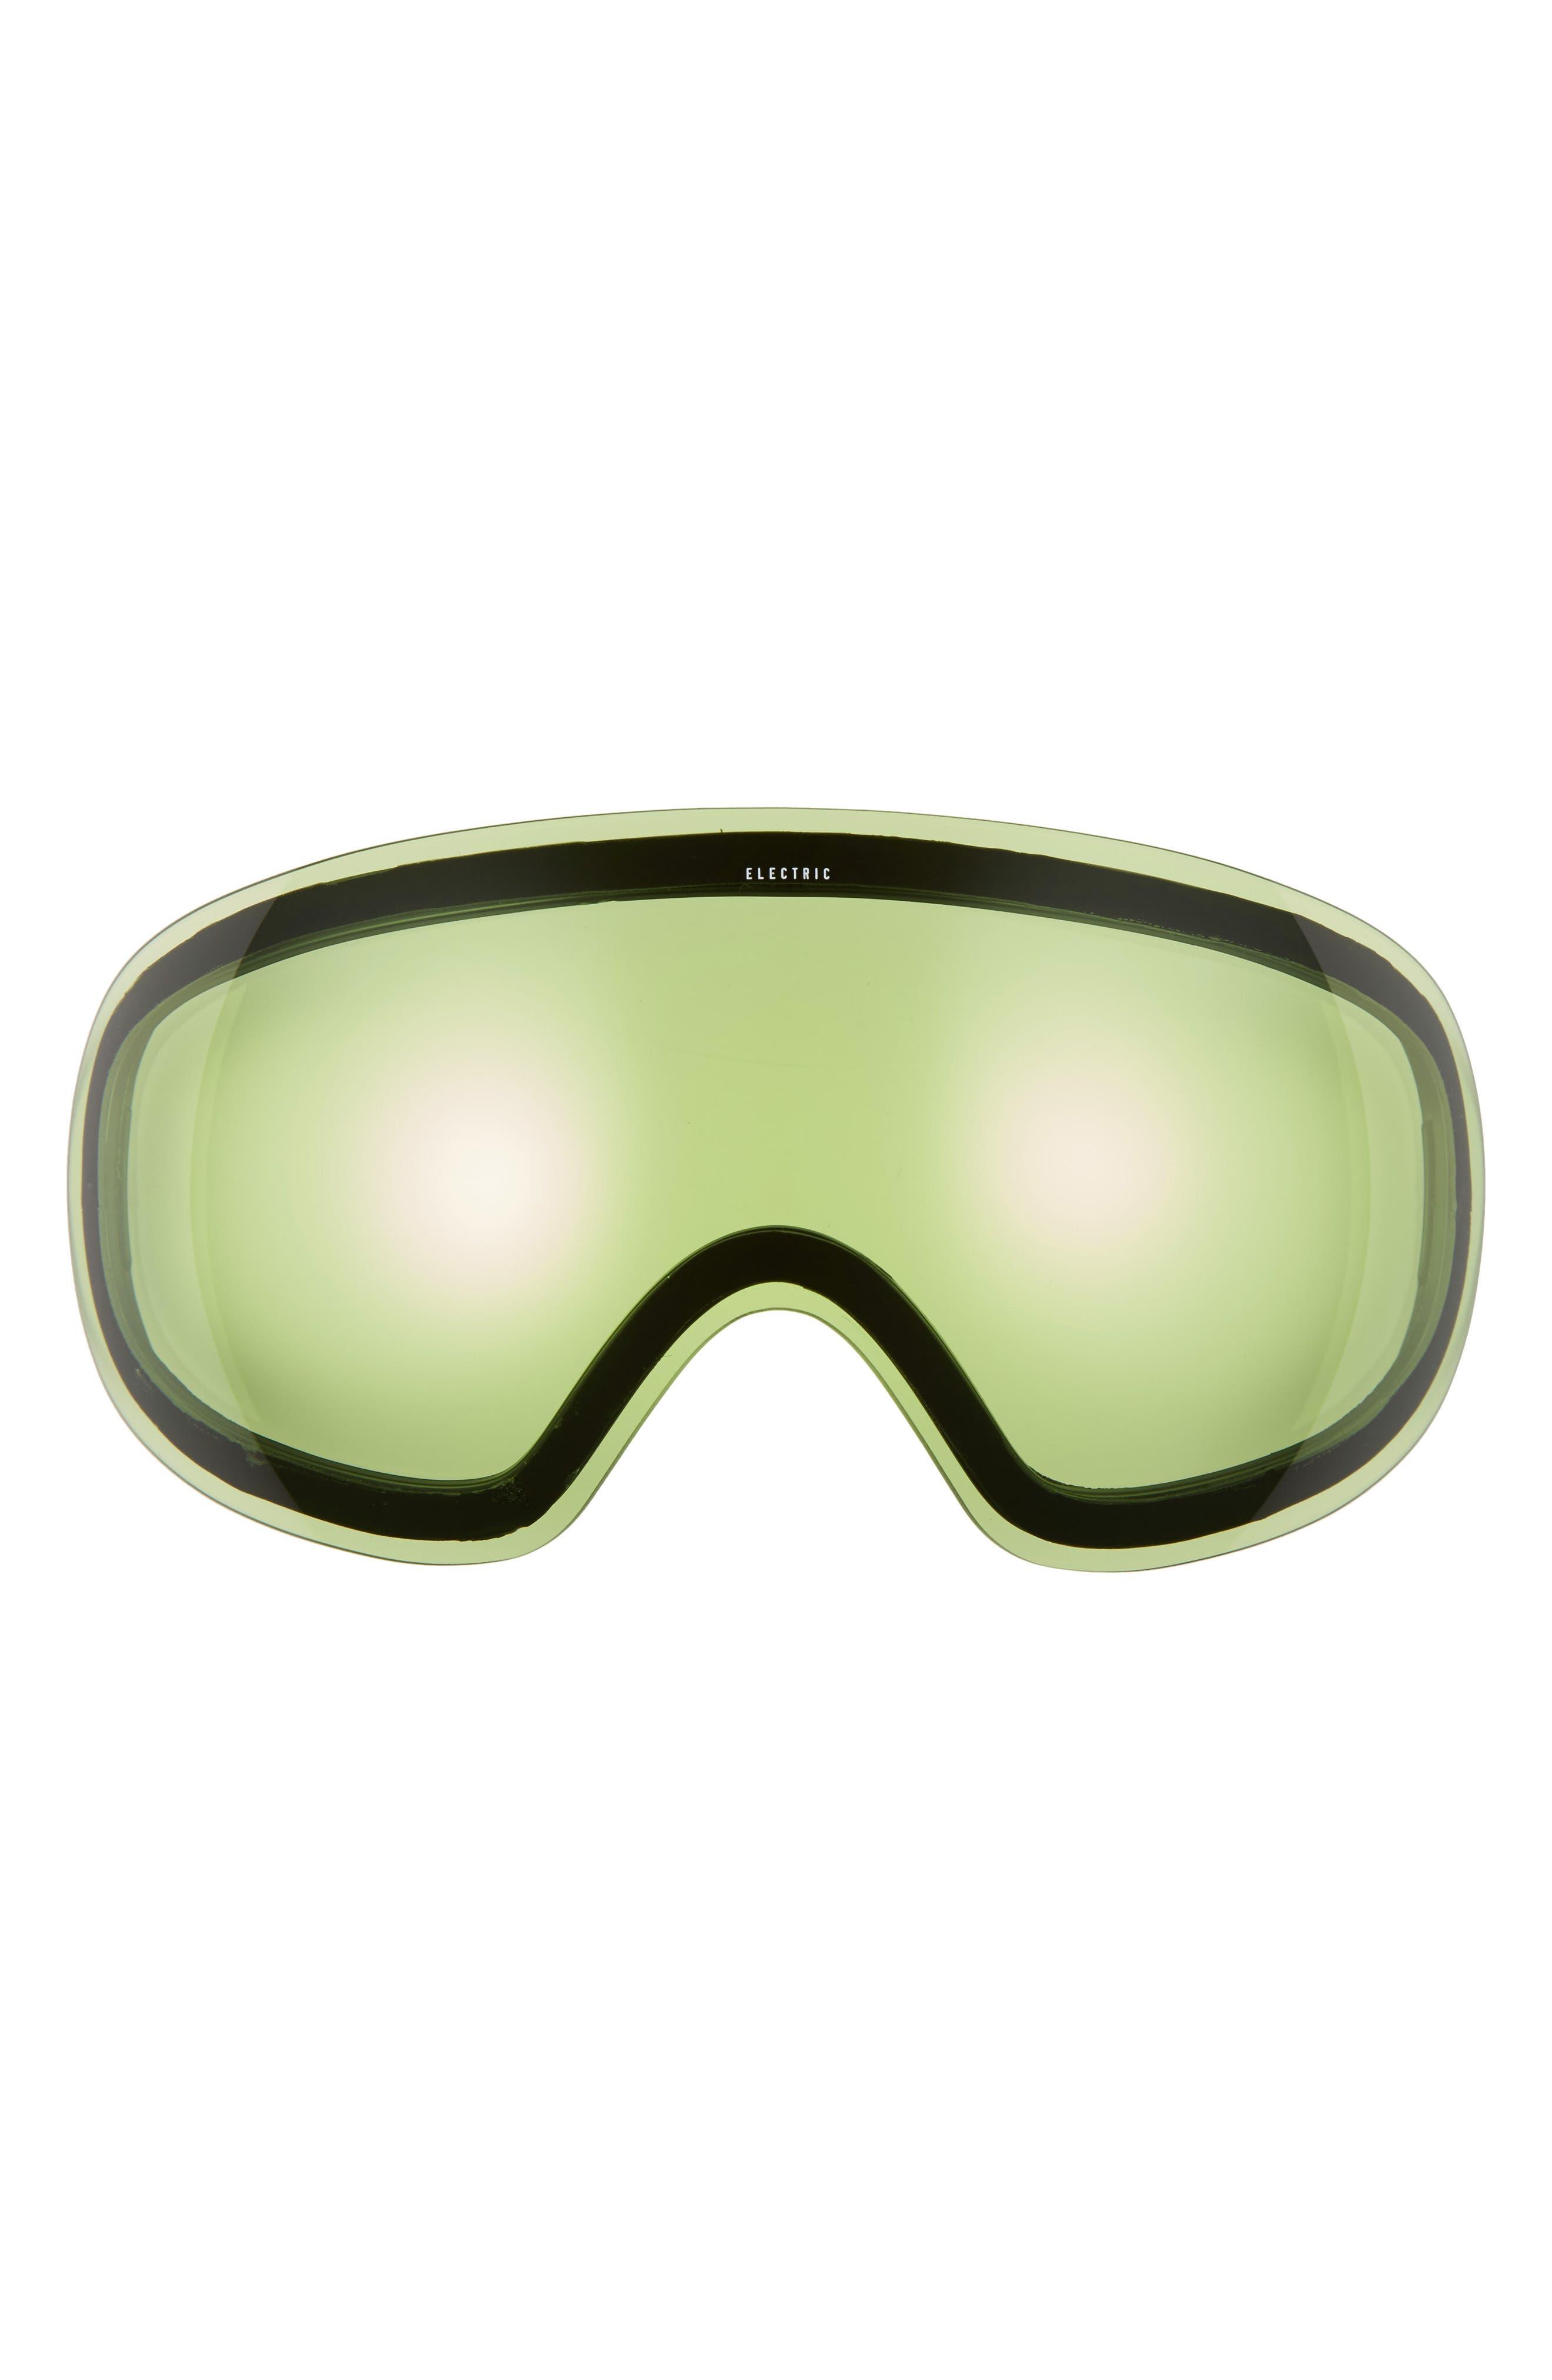 EG3 254mm Snow Goggles,                             Alternate thumbnail 34, color,